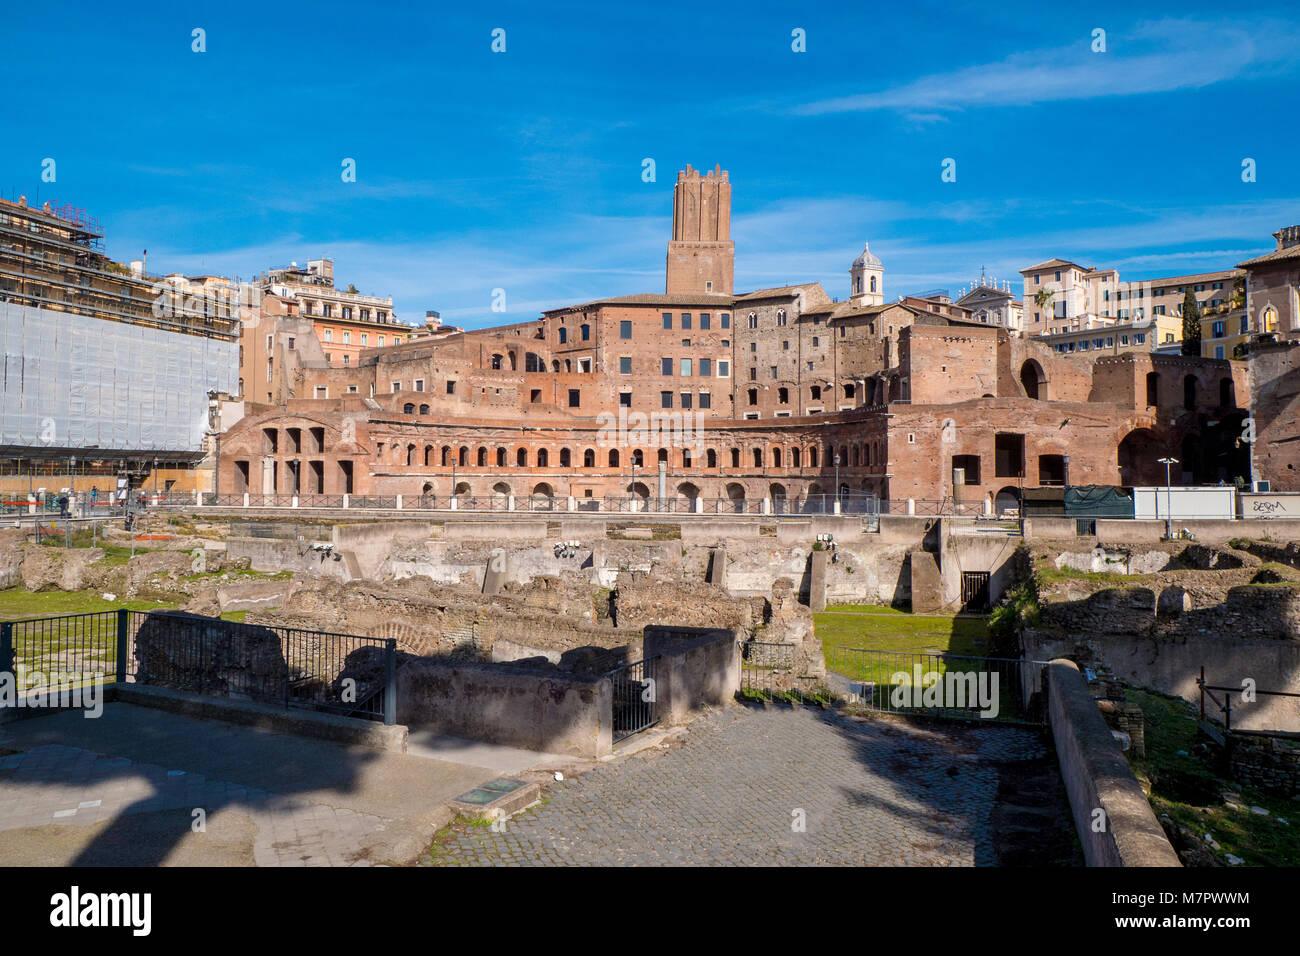 Trajan Market (Mercati di Traiano) near the Roman Forum and Trajan's Column in Rome, Italy - Stock Image